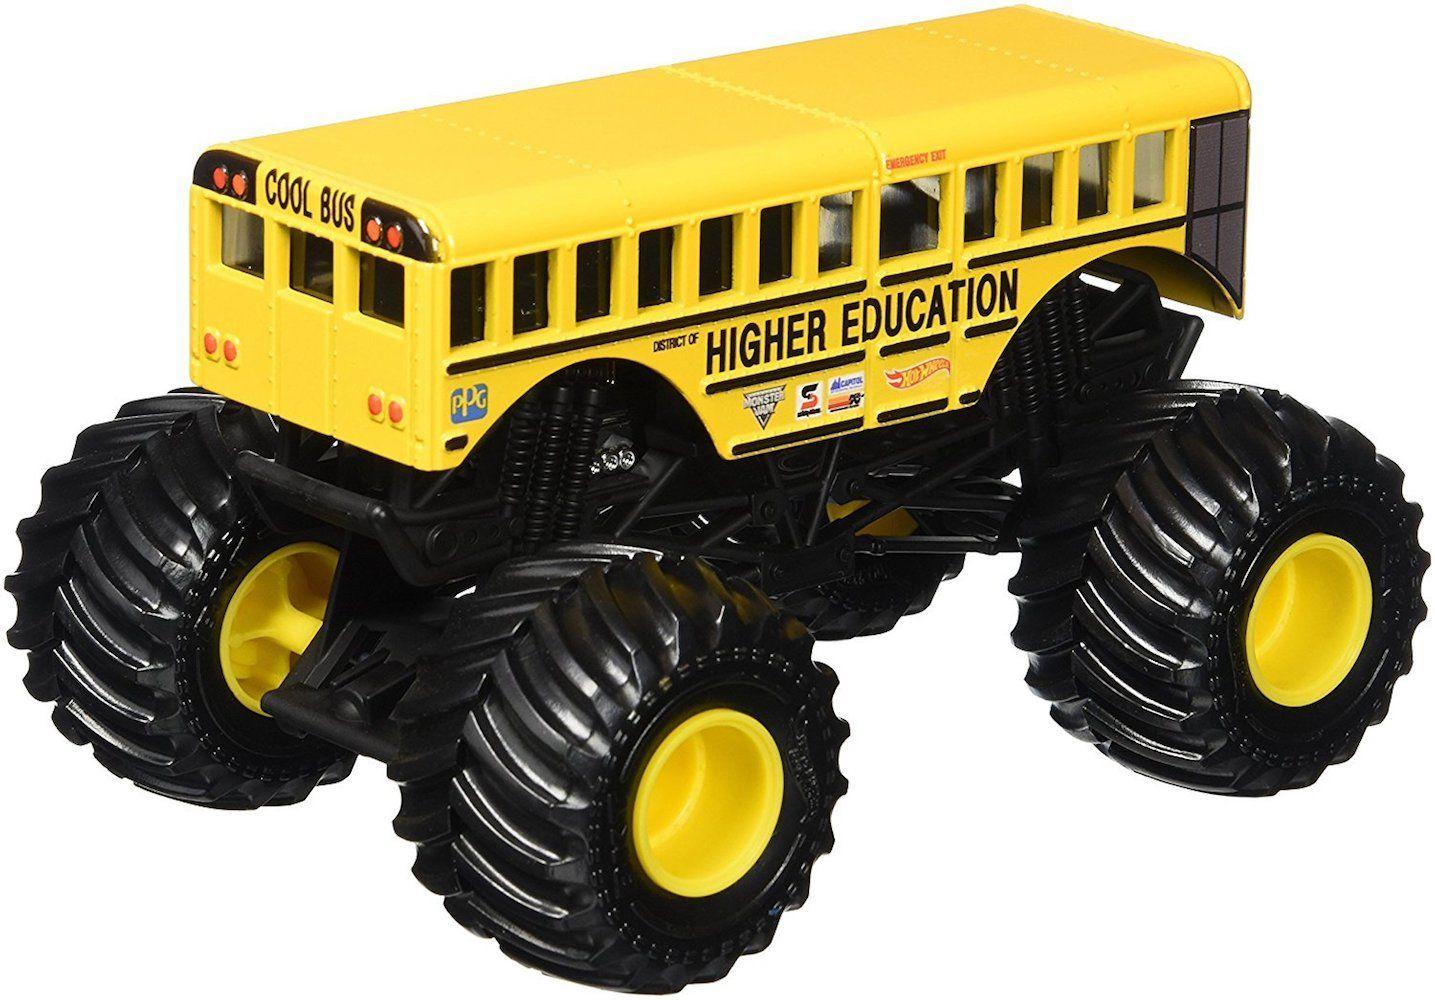 Hot Wheels Monster Jam Higher Education DieCast Vehicle 1